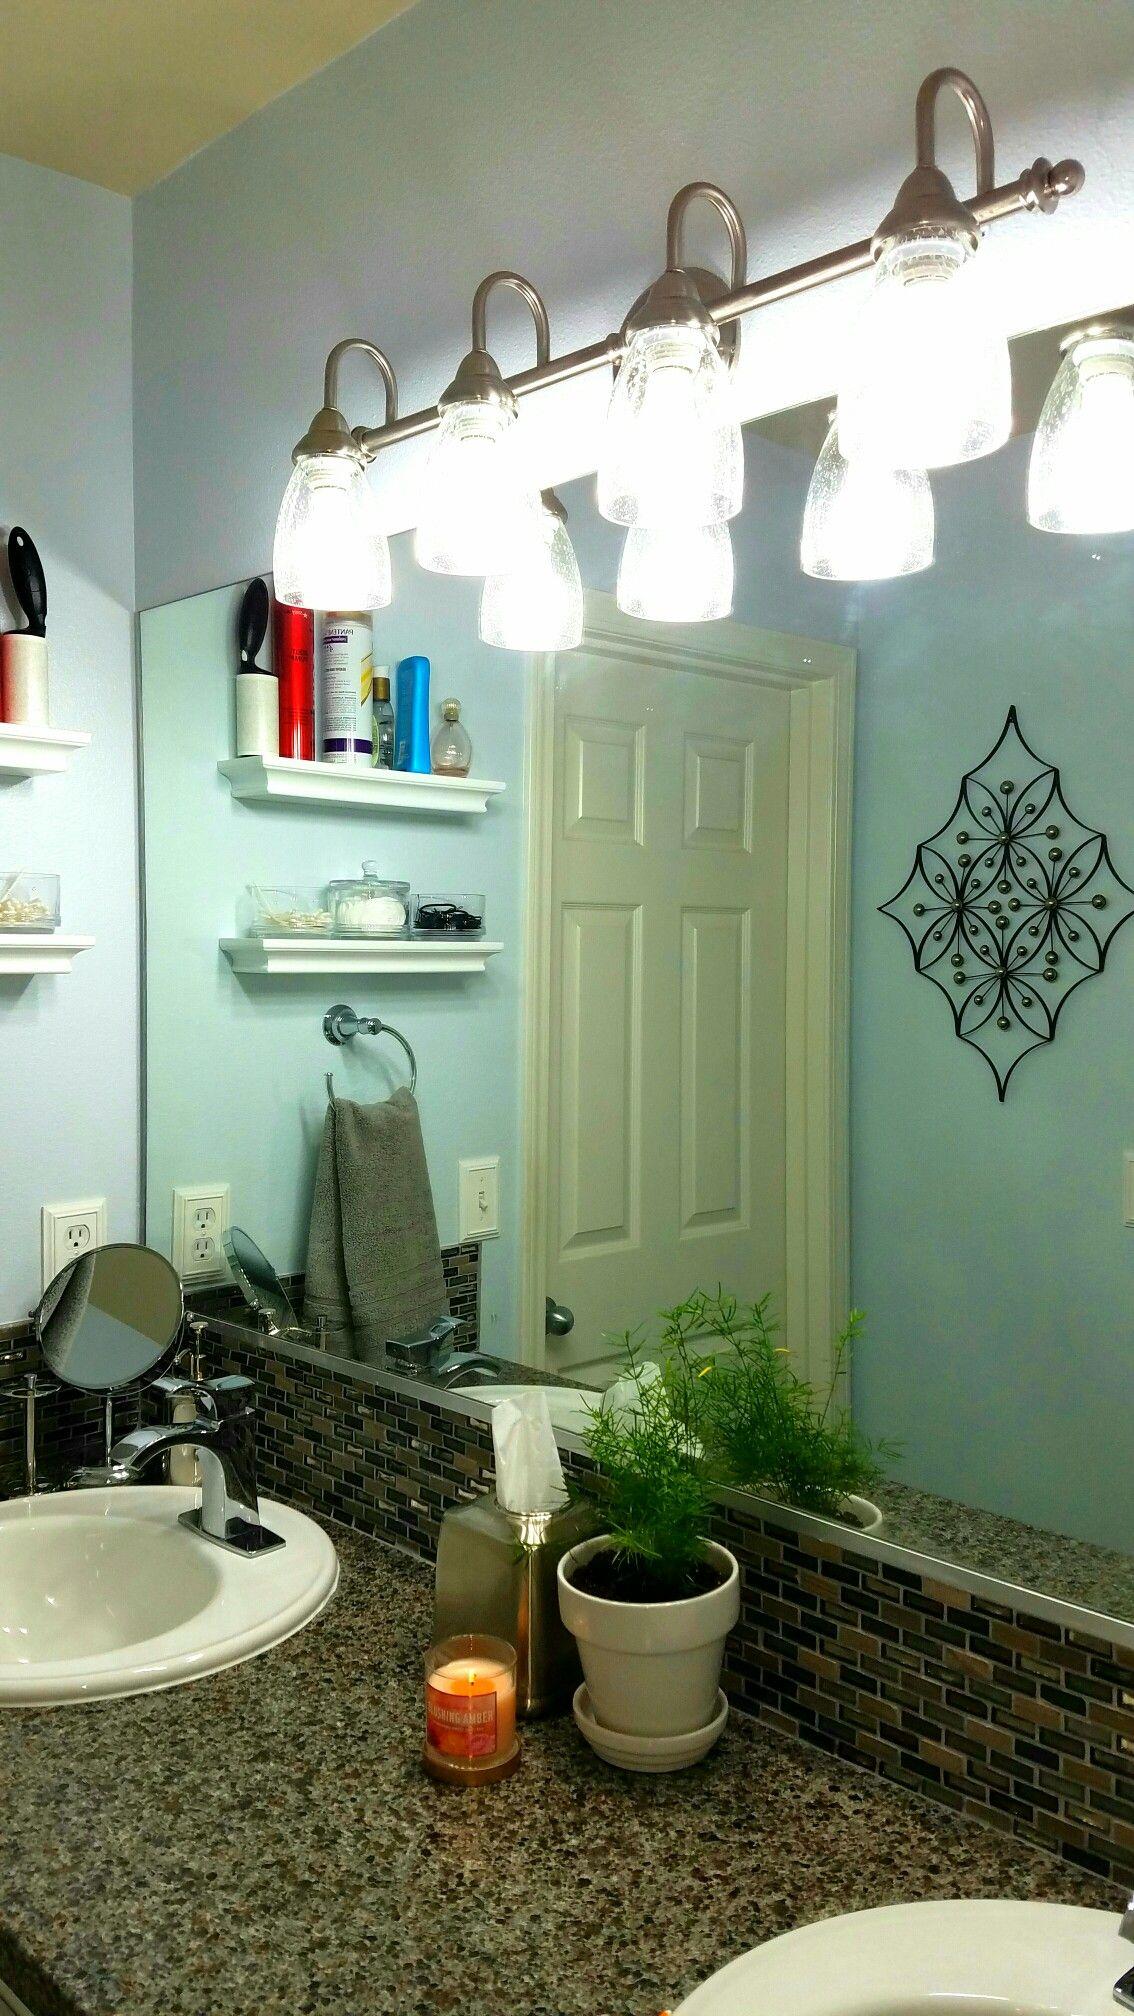 Bathroom wall decor, no light plant, bathroom accessories, white ...